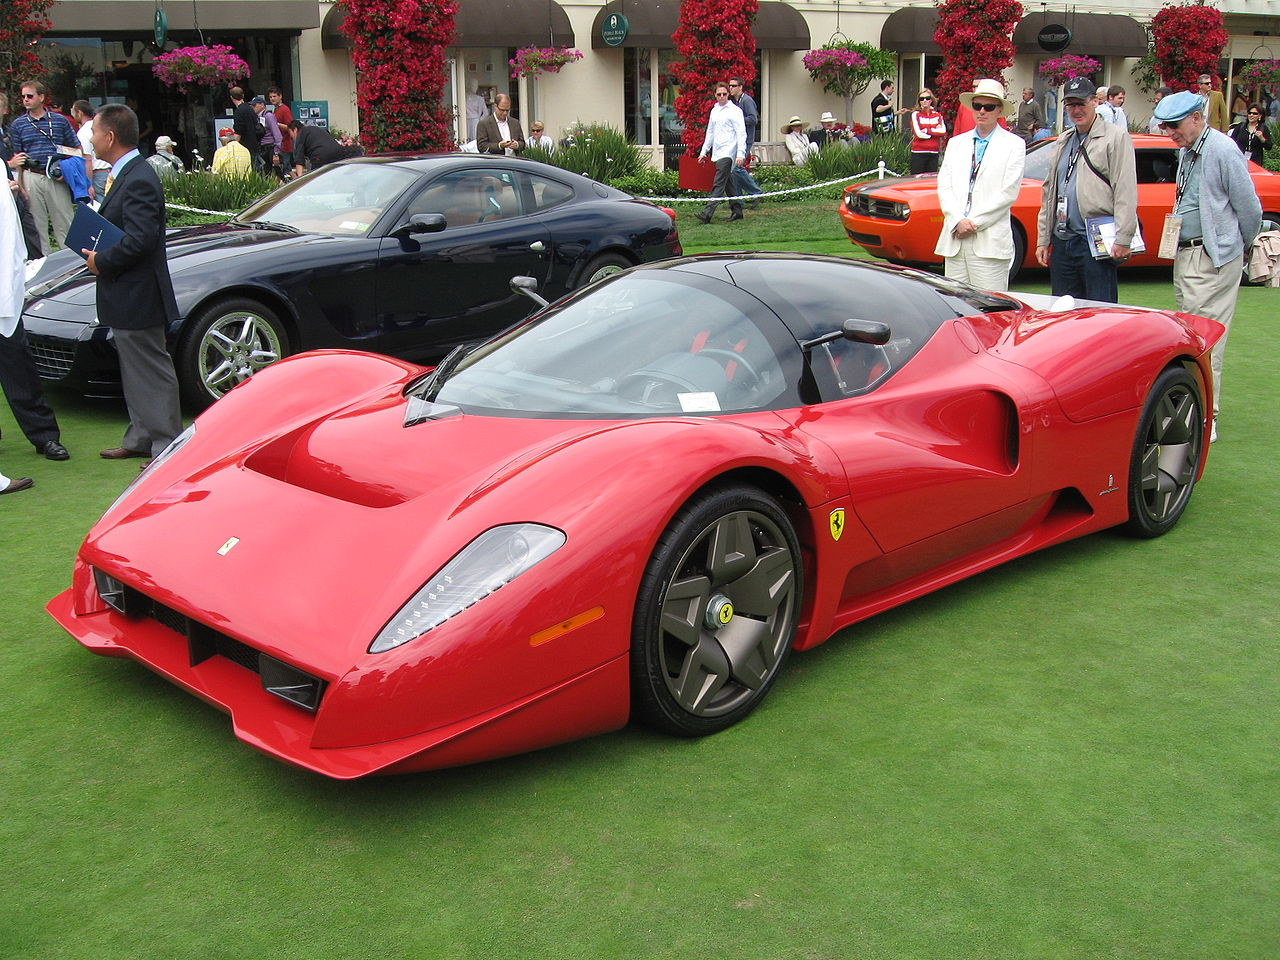 1280px-Ferrari_P45_front_right.jpg